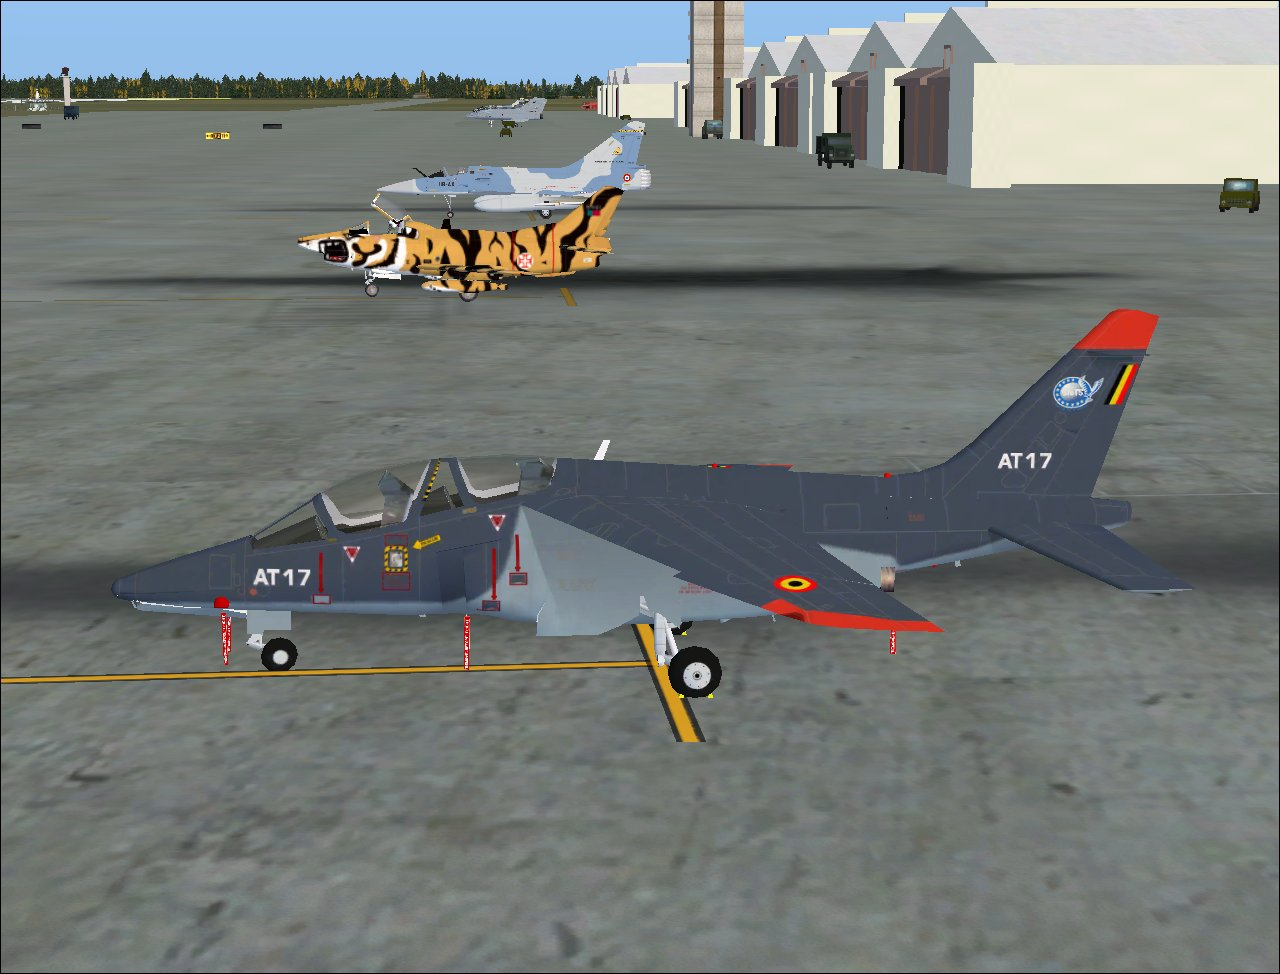 airjorge fotos flight simulation fiat g 91 tiger meet. Black Bedroom Furniture Sets. Home Design Ideas